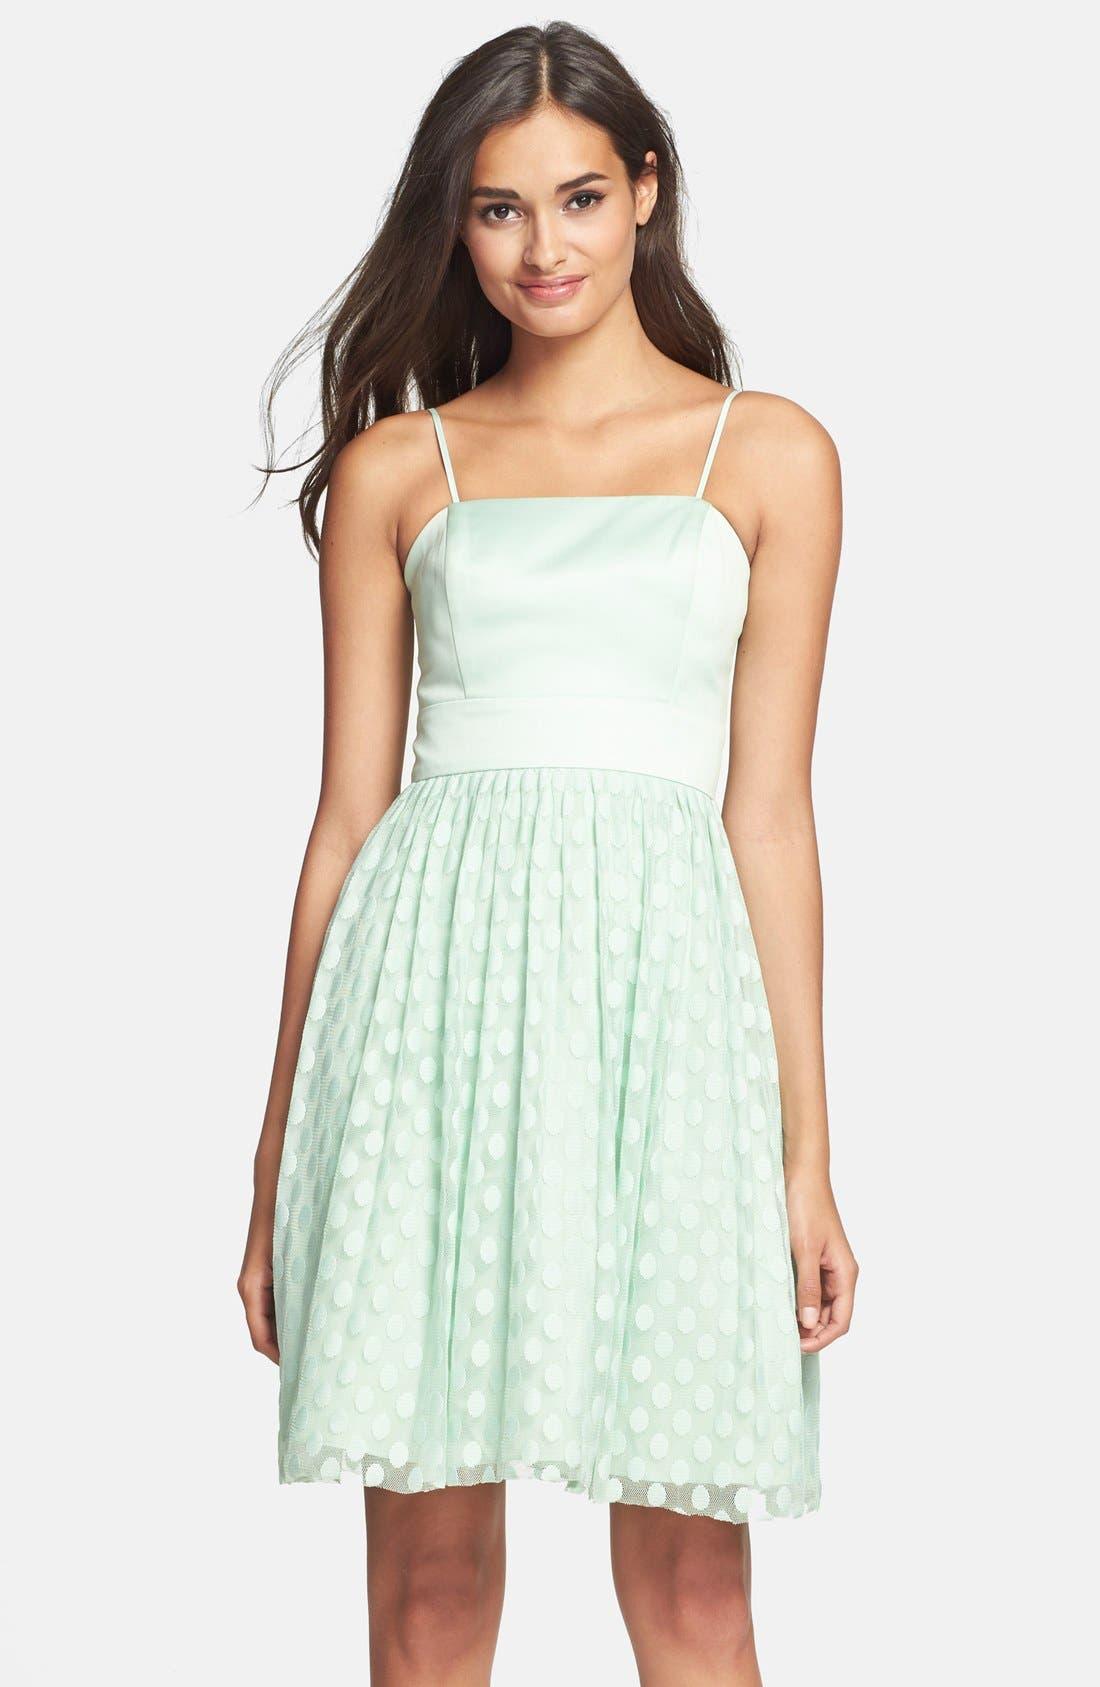 Alternate Image 1 Selected - Eliza J Polka Dot Mesh Fit & Flare Dress